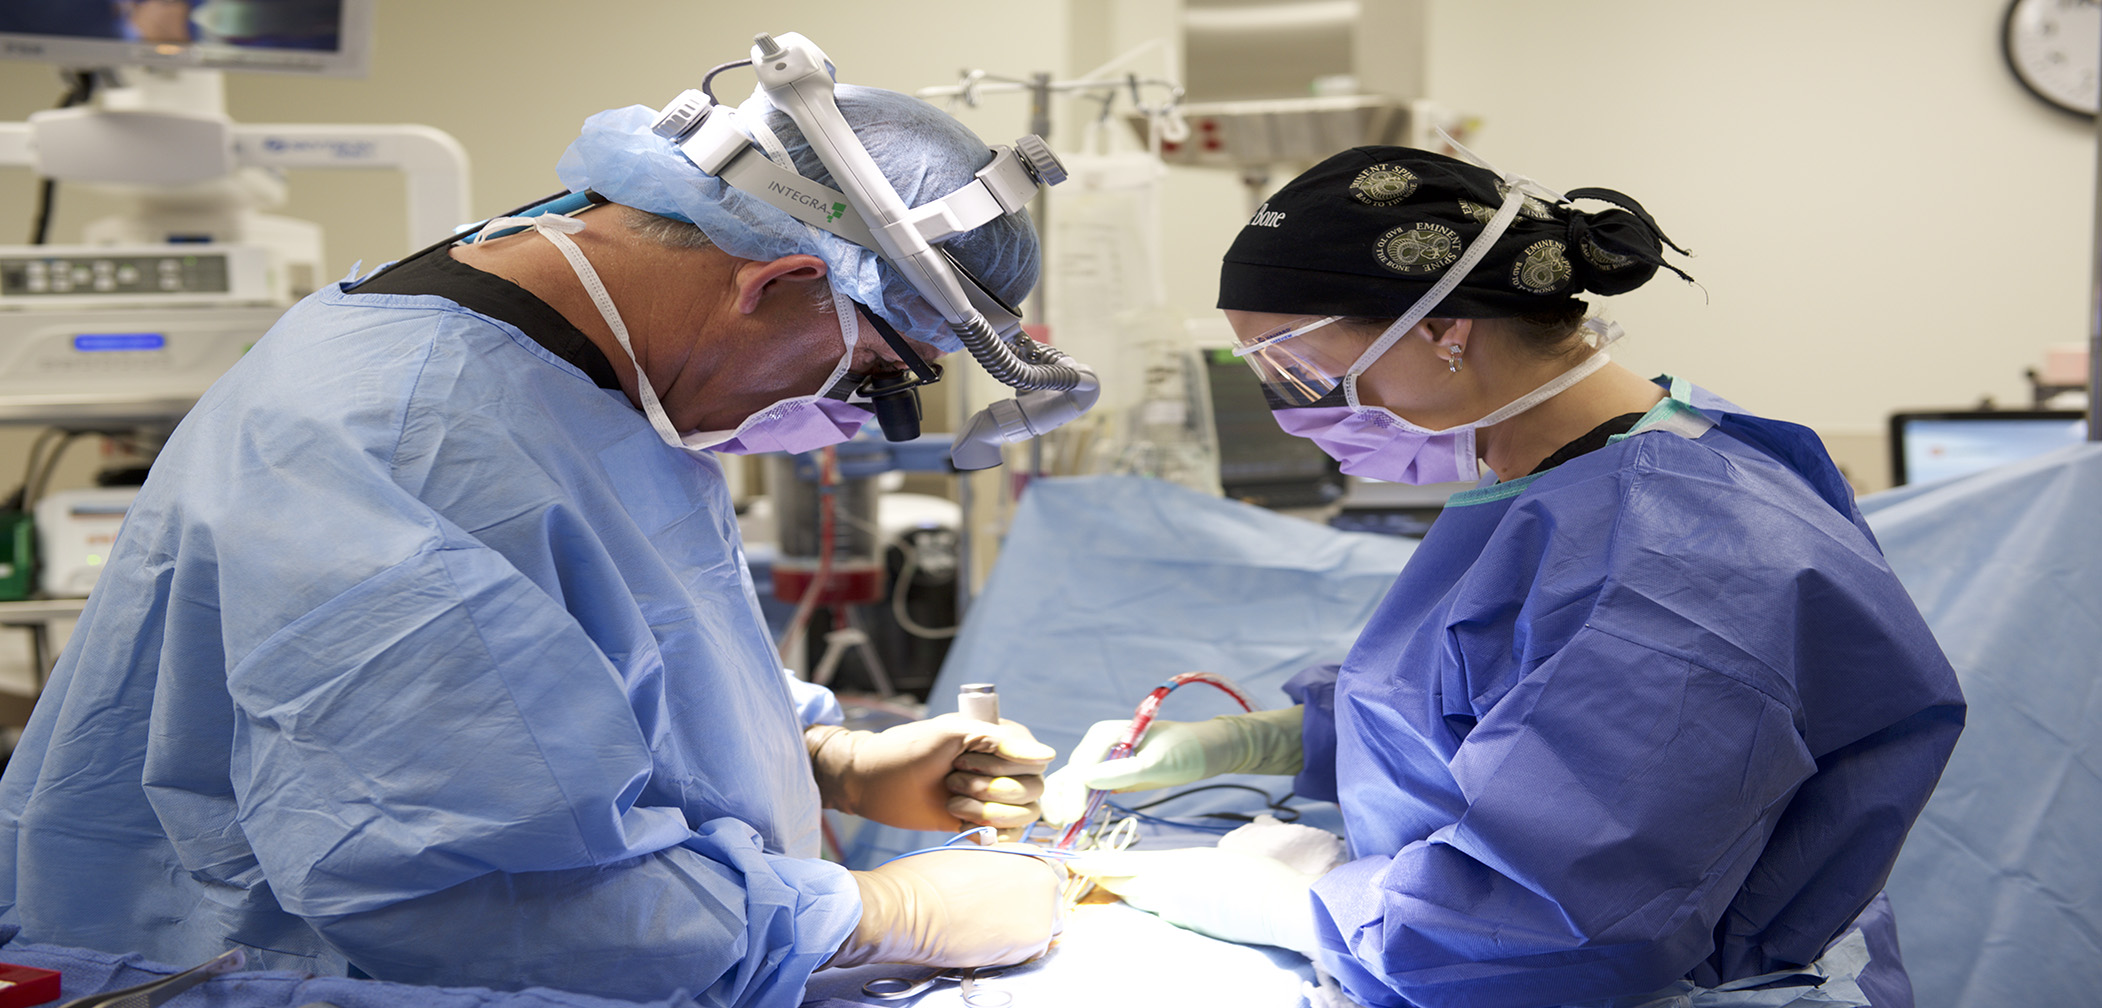 Dr Courtney preformng spine surgery at Eminent Medical Center